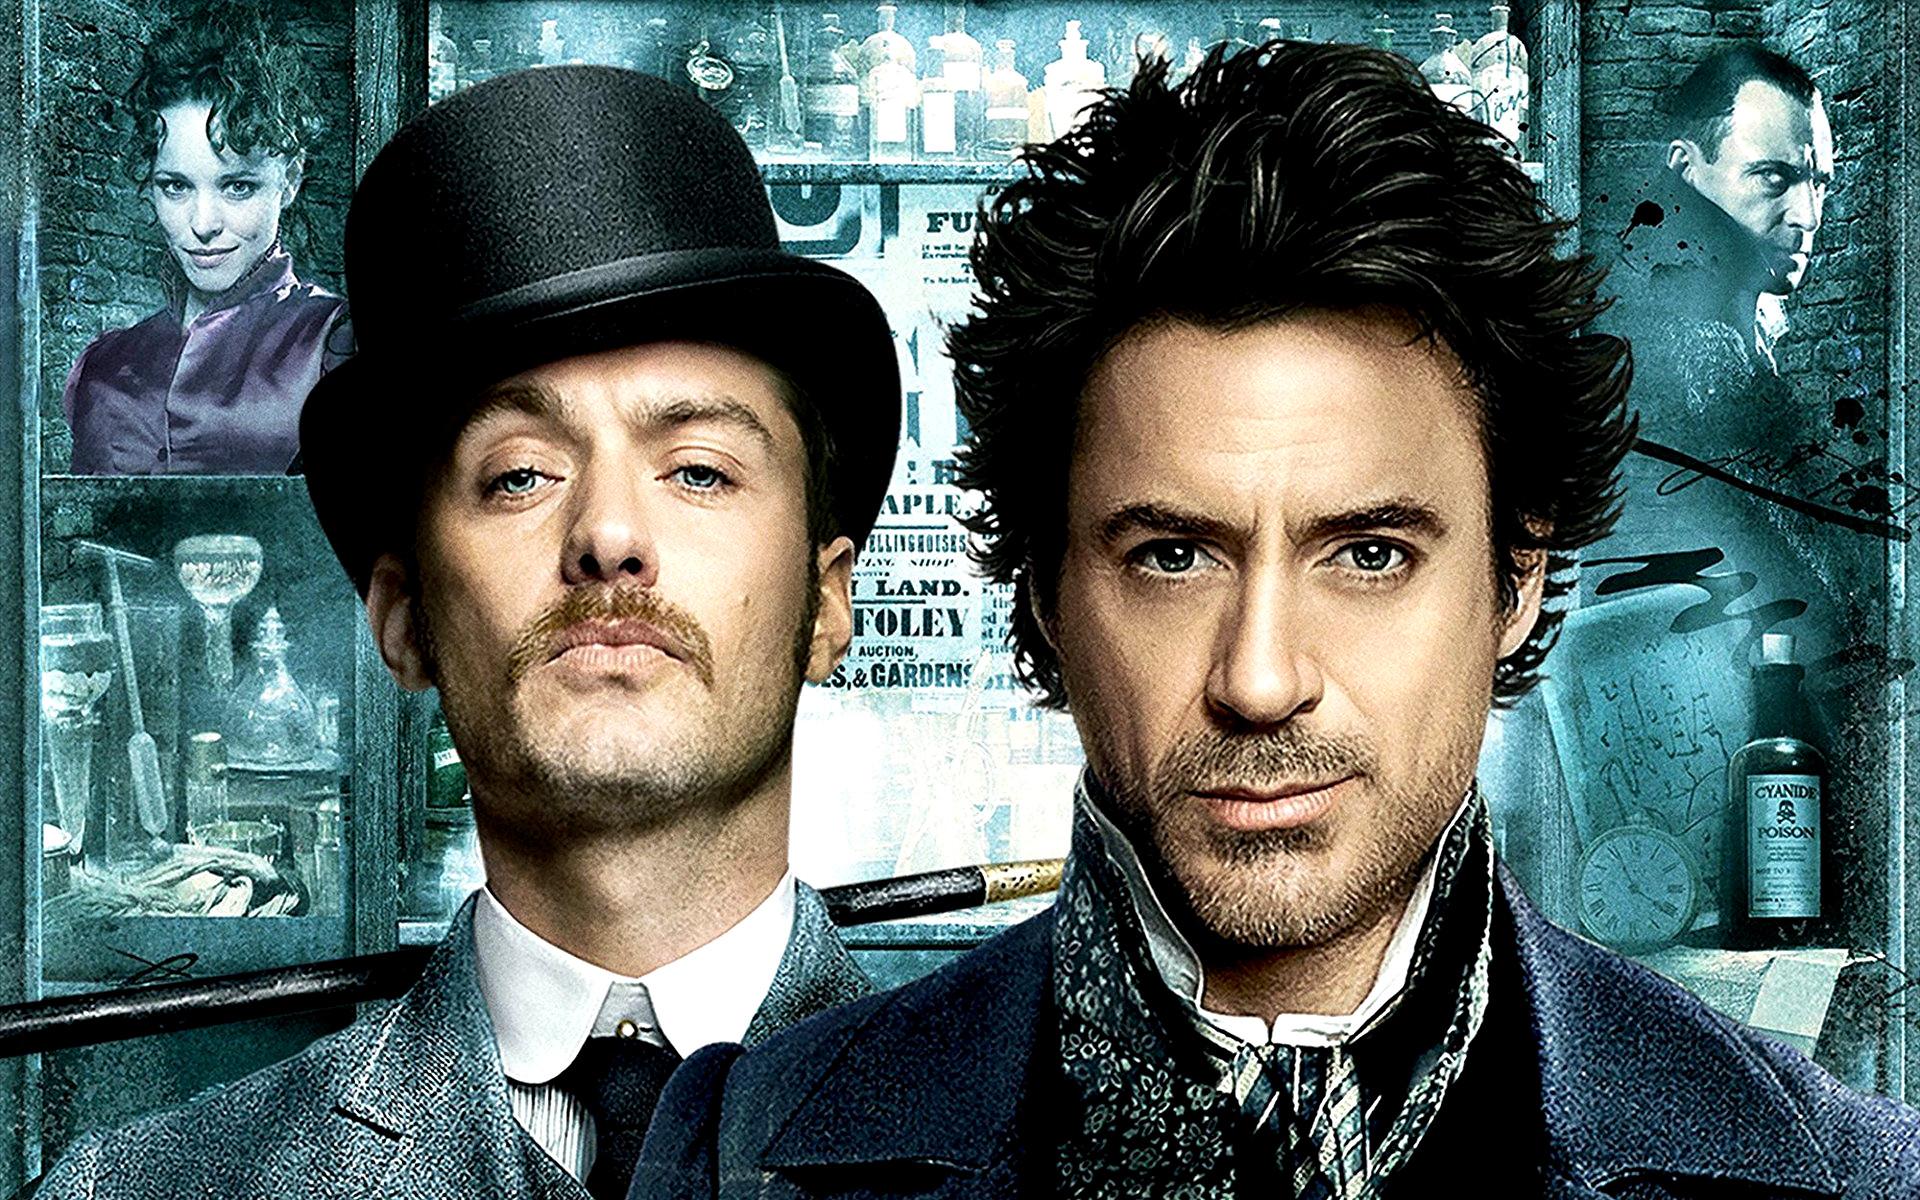 Guy Ritchie Sherlock Holmes 3